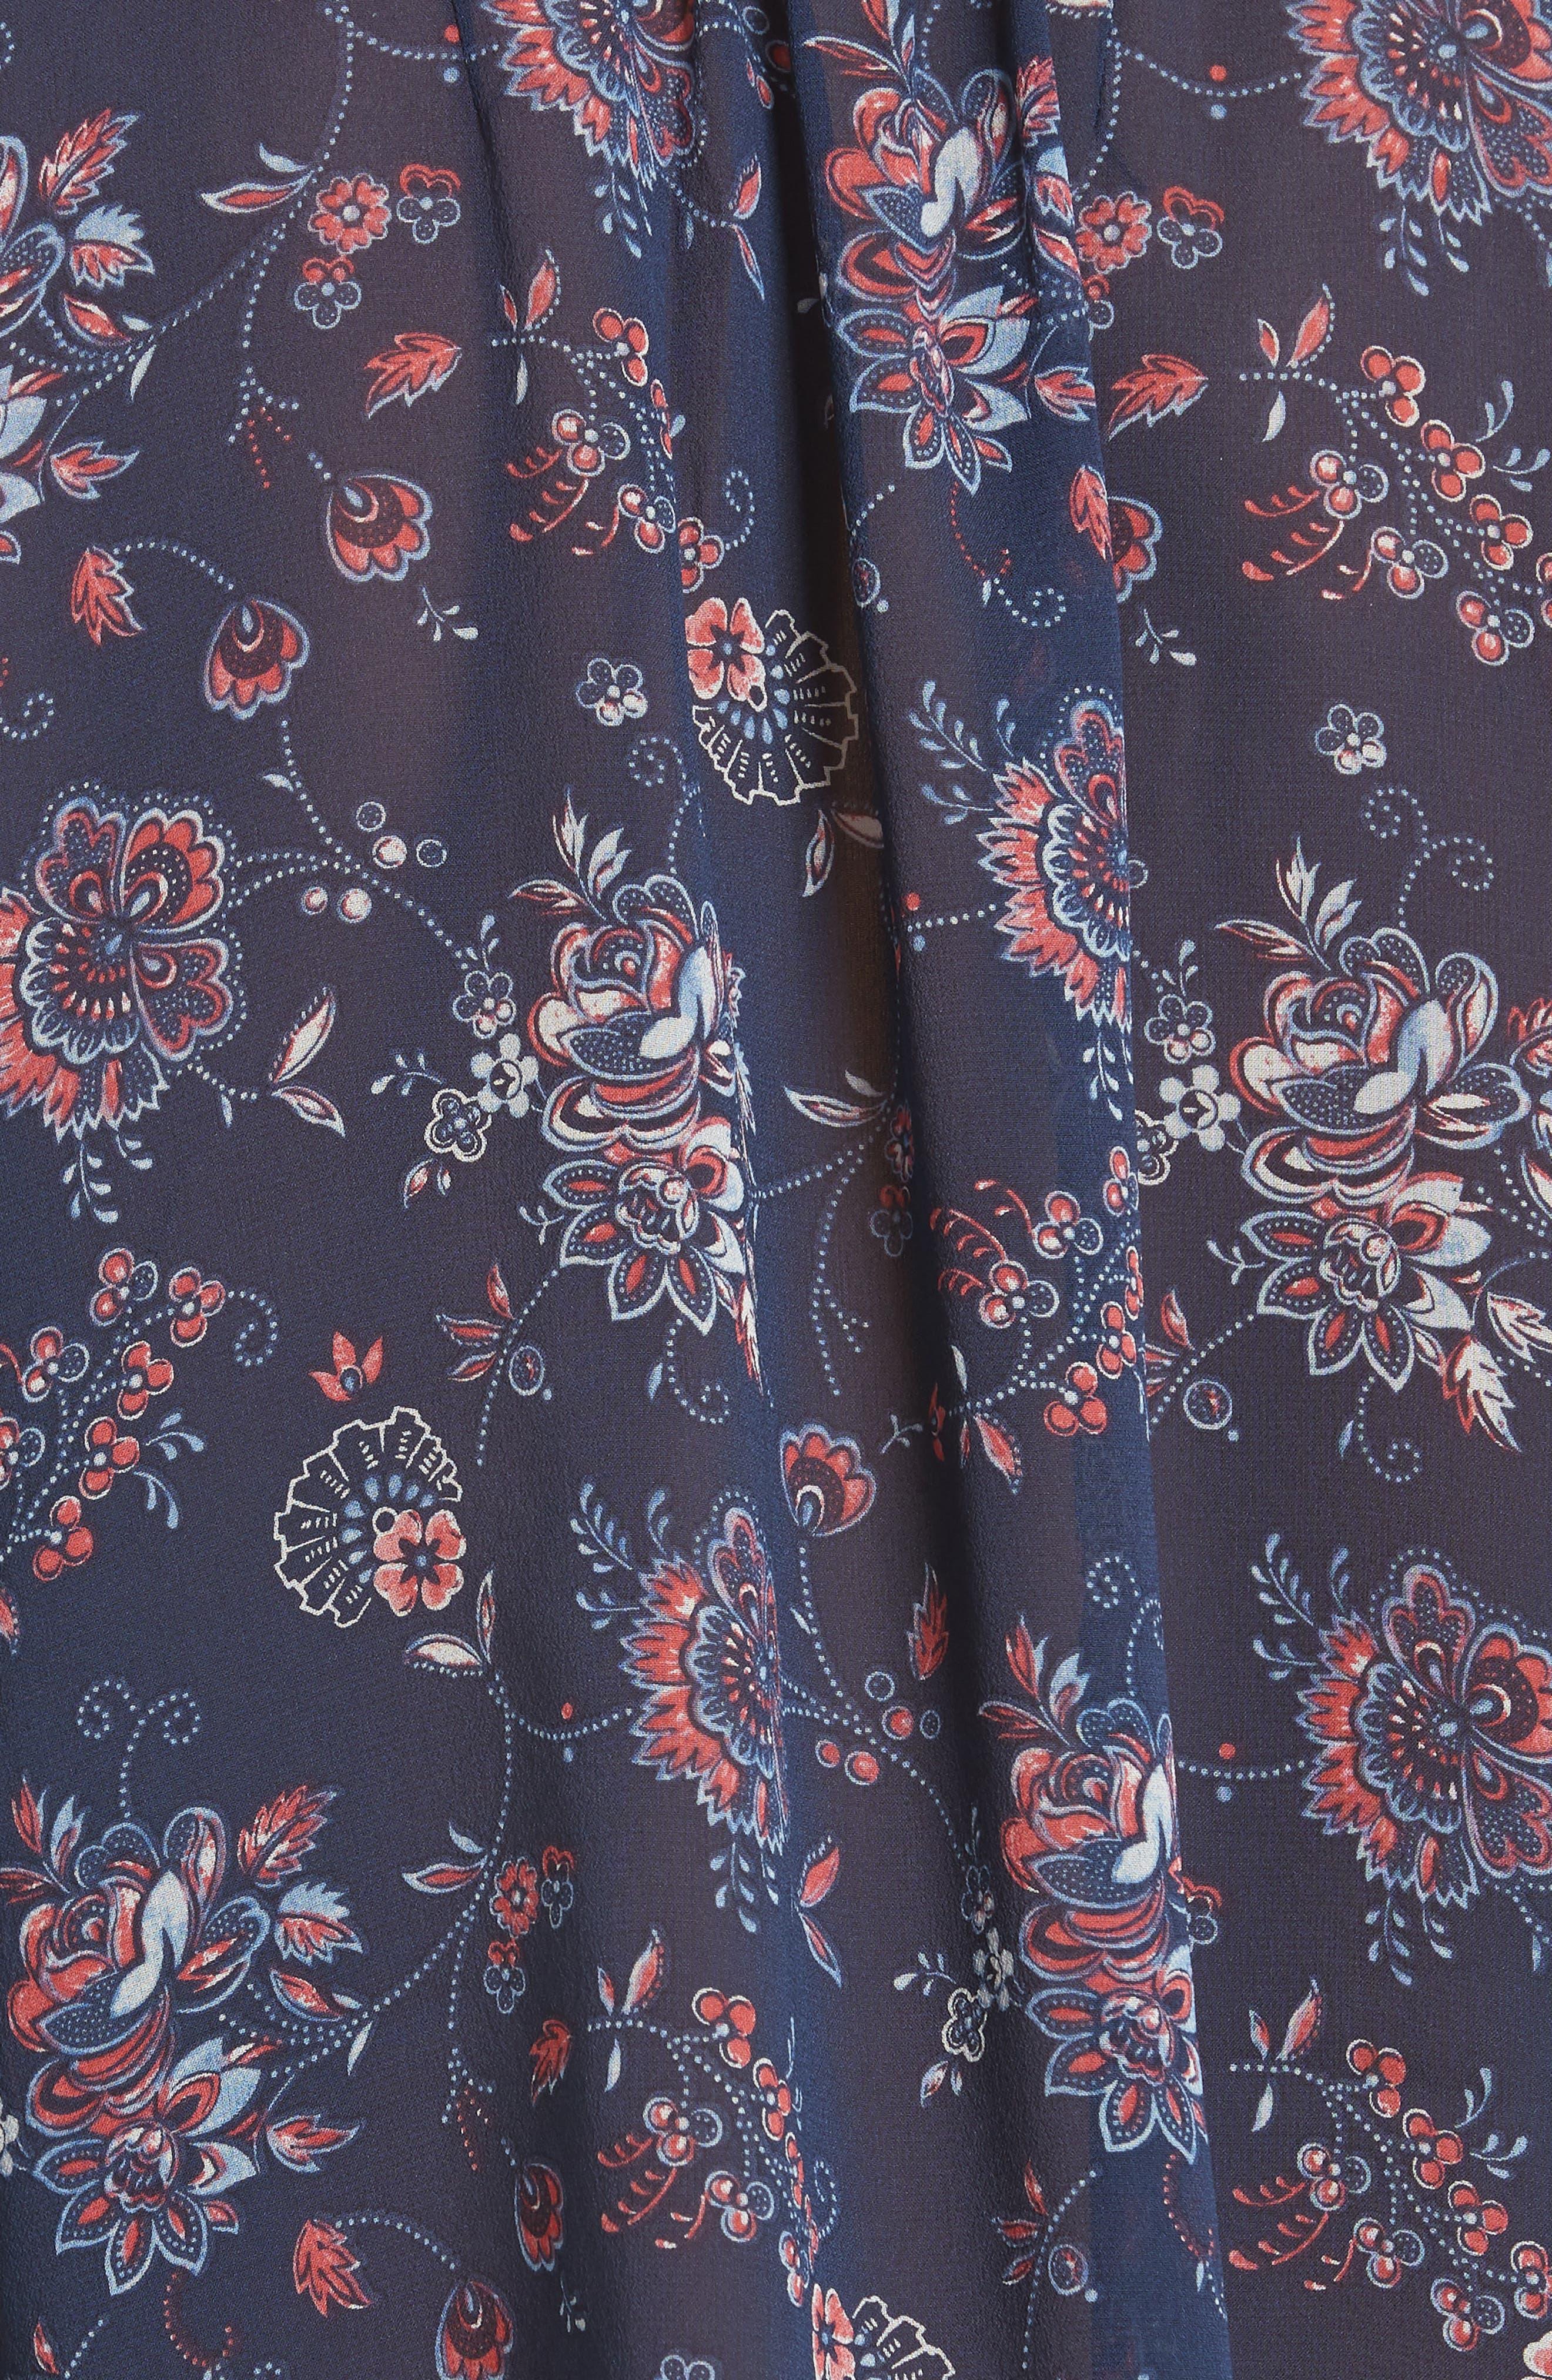 Bolona Floral Silk Blouse,                             Alternate thumbnail 5, color,                             Dark Navy